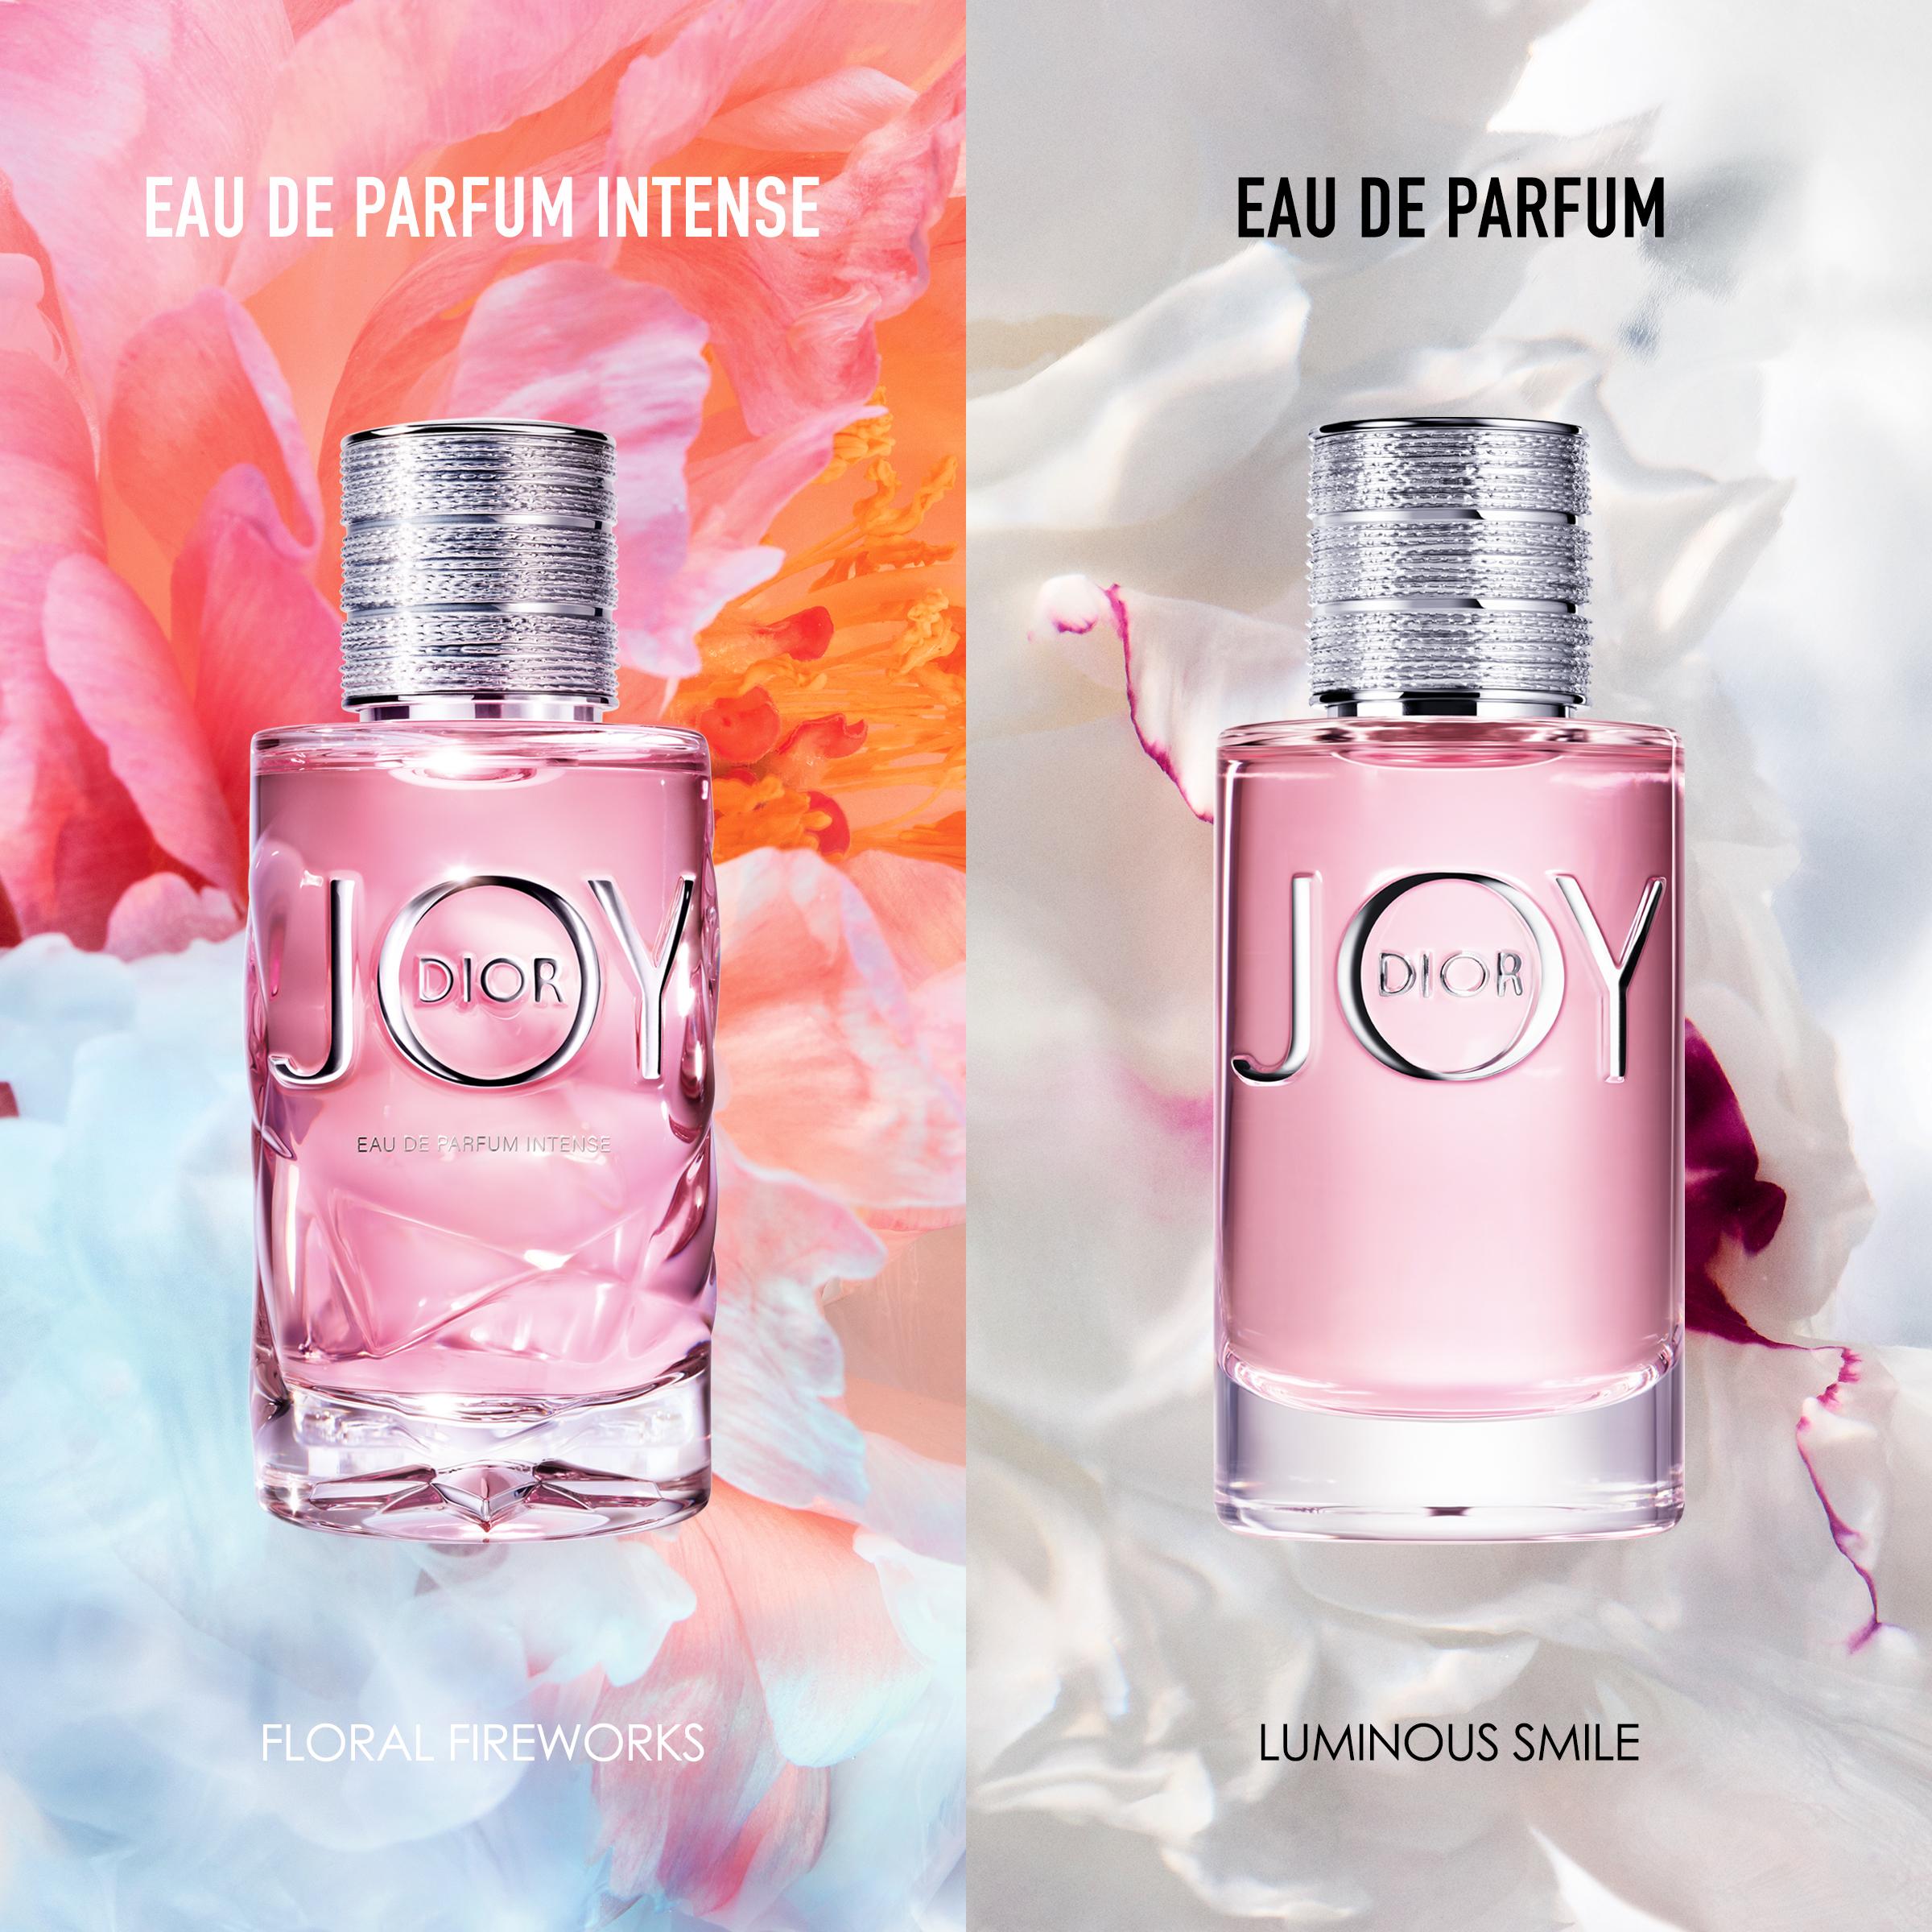 DIOR JOY by Dior Eau de Parfum Intense, 30 ml